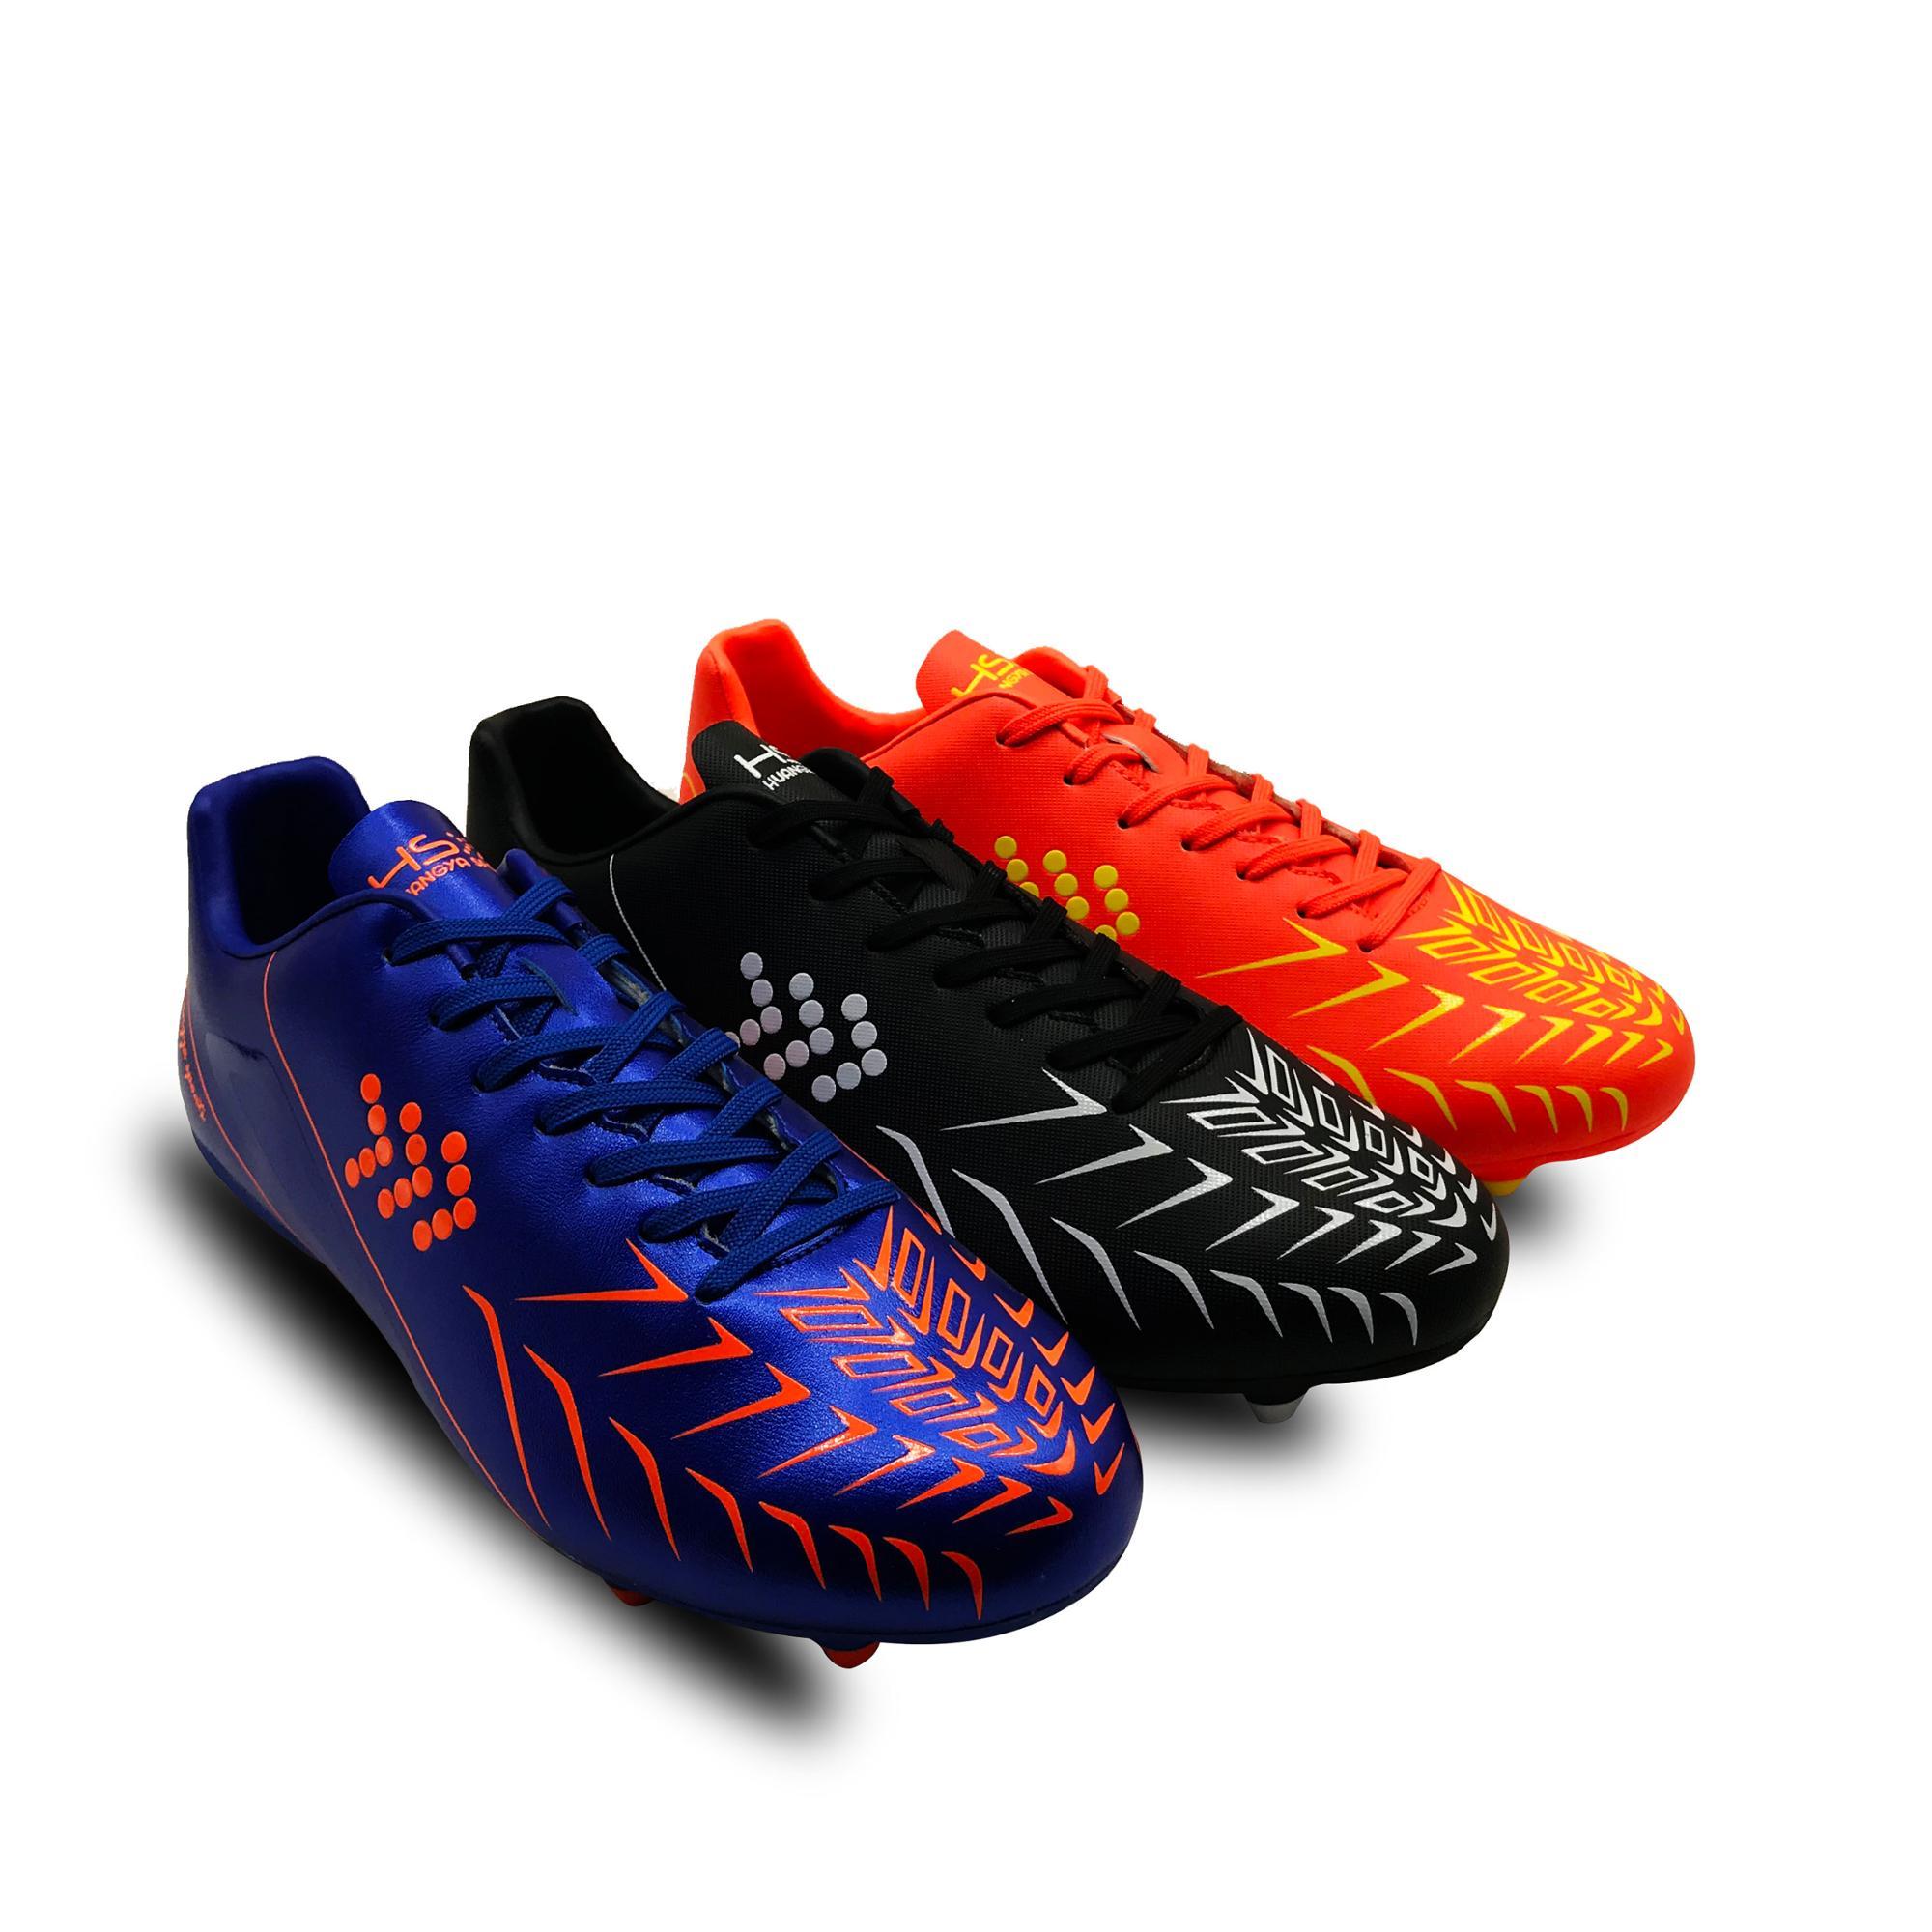 83cffb667e4e New Design Football Shoes Professional Football Shoes High Quality Indoor  Football Shoes Soccer Boots 2019